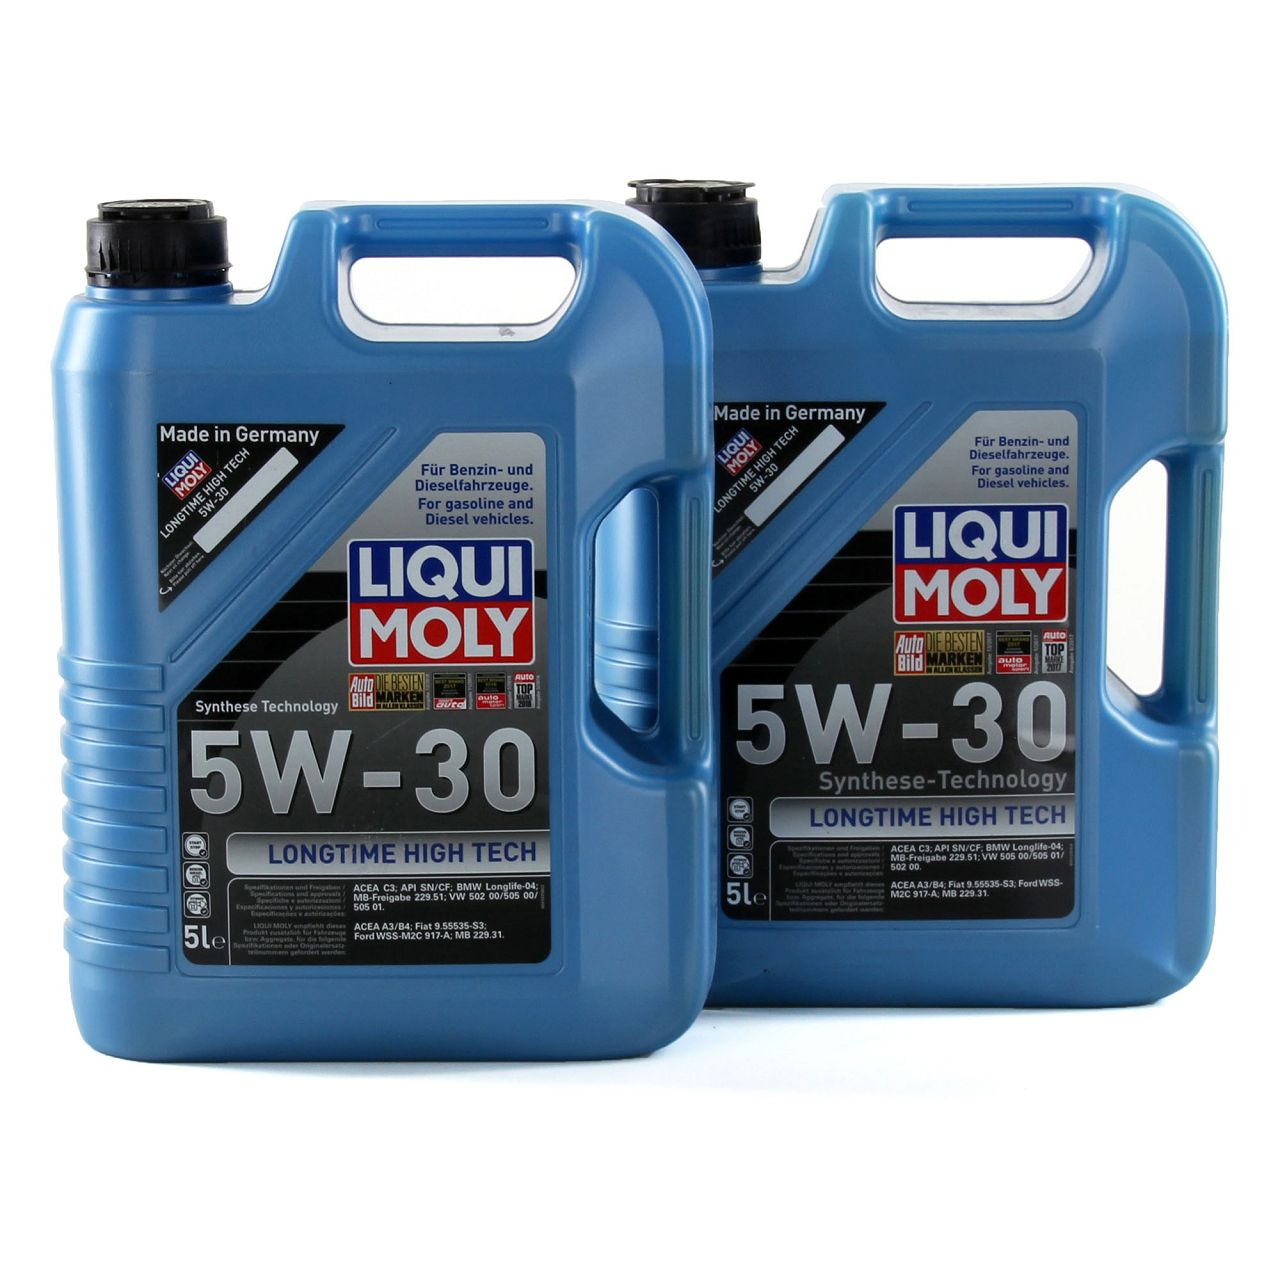 LIQUI MOLY Motoröl Öl LONGTIME HIGH TECH 5W30 5W-30 10L 10Liter 1137